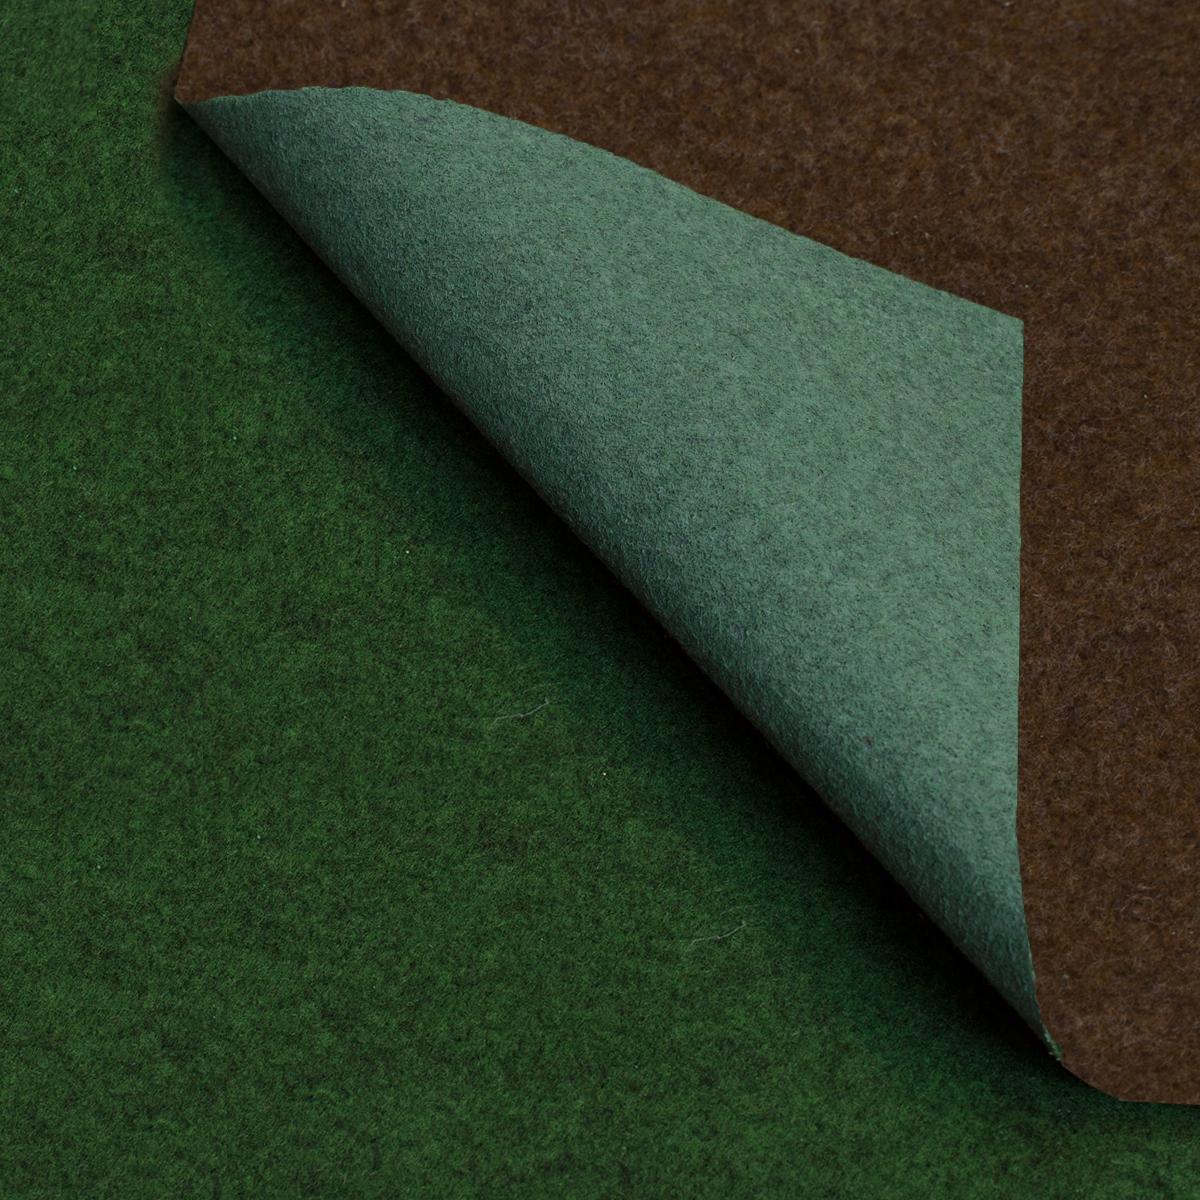 kunstrasen rasenteppich fertigrasen summergreen basic 133cm. Black Bedroom Furniture Sets. Home Design Ideas